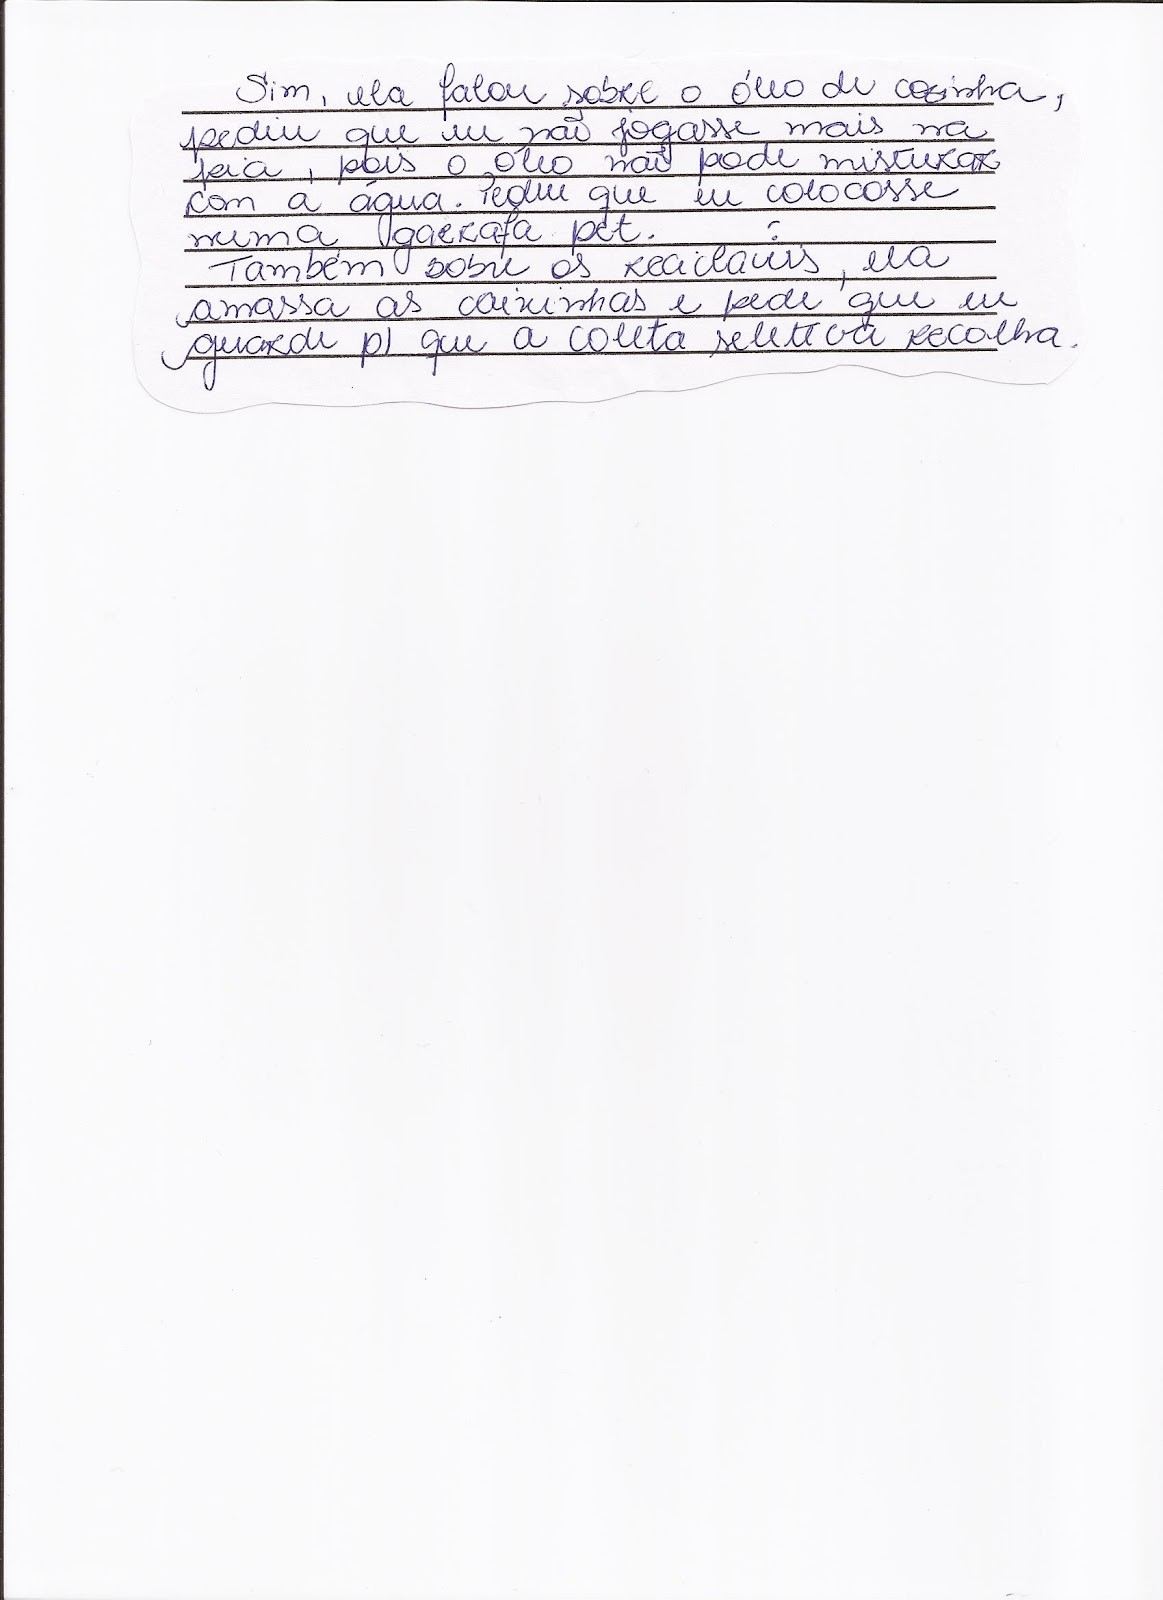 Portfólio do Concurso de Teatro Águas de Joinville: PRIMEIRA  #5E5774 1163 1600